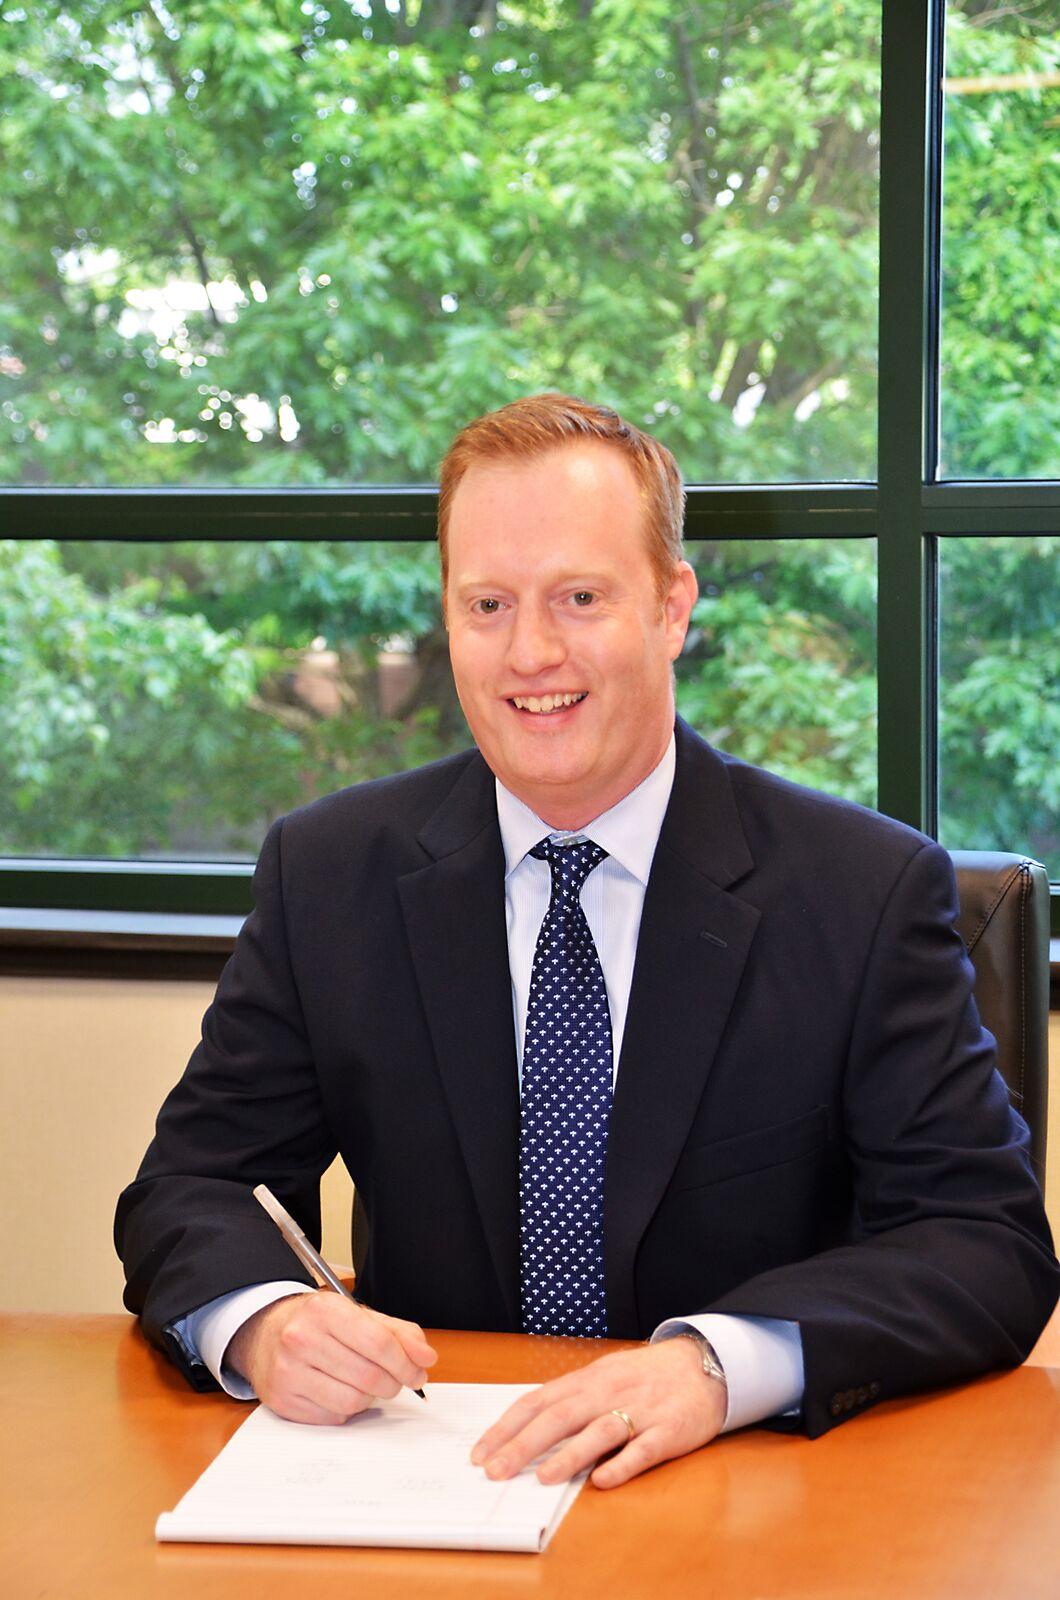 Matt Garson - Second Ward Nether Providence Township commissioner